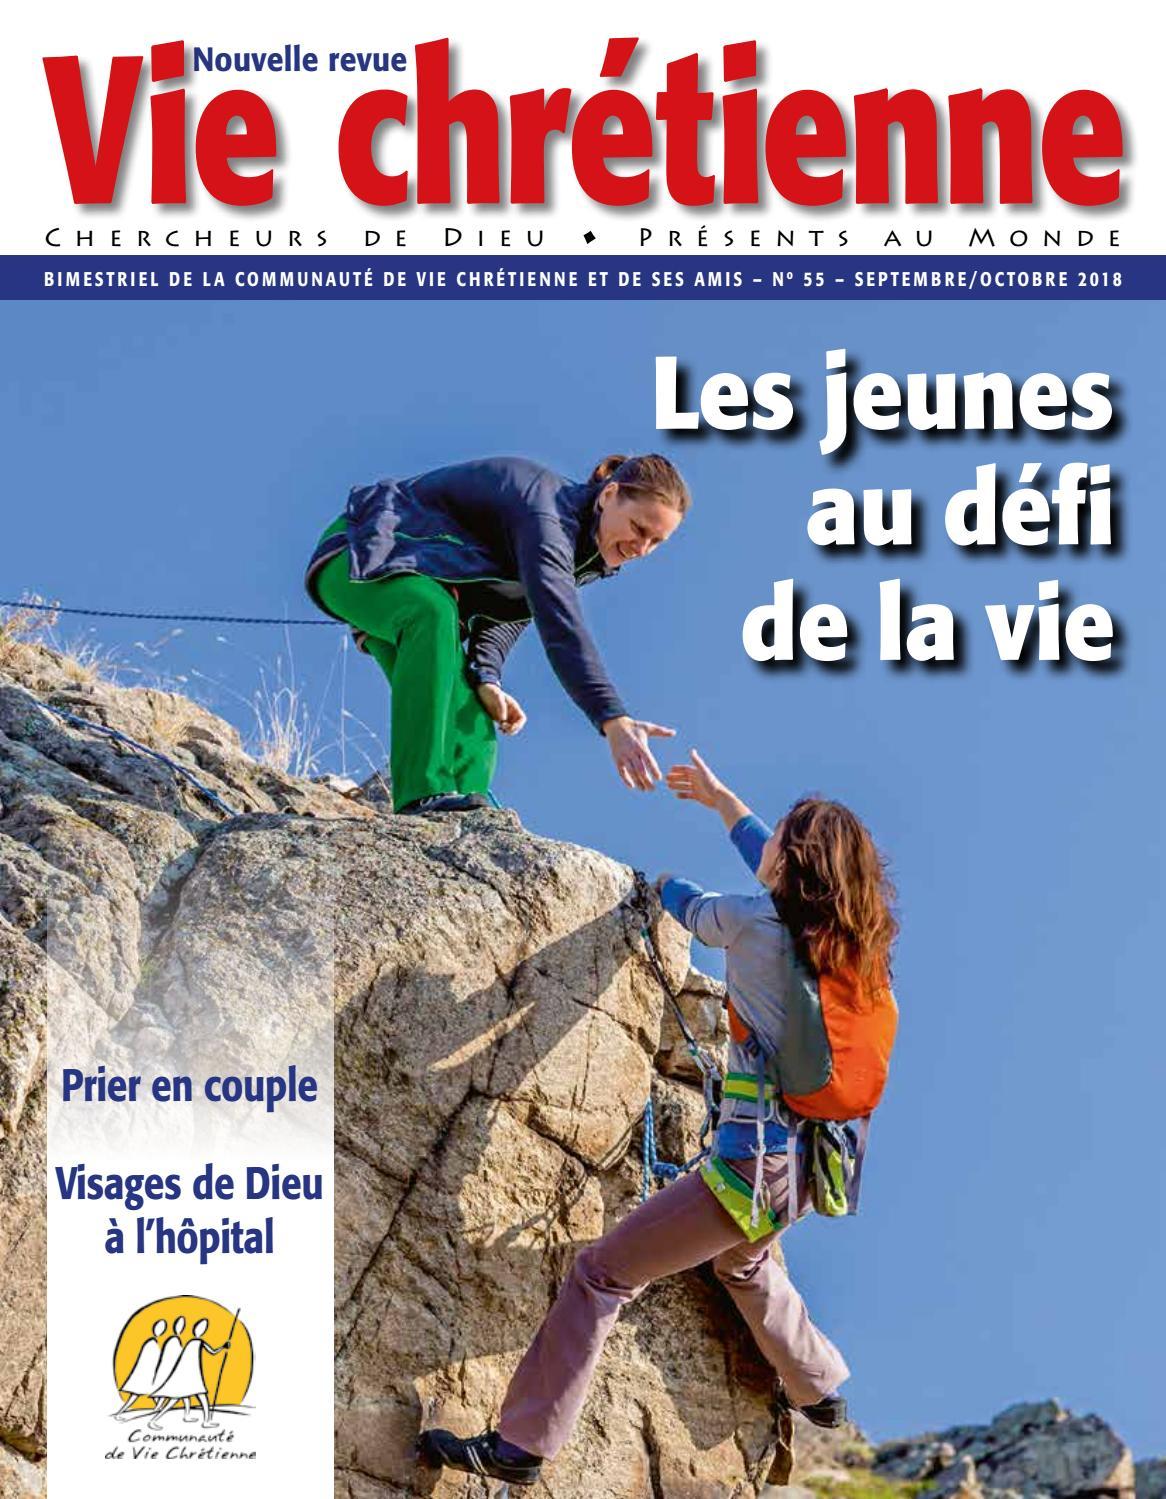 Revue Vie Chretienne N 55 Septembre Octobre 2018 By Editions Vie Chretienne Issuu